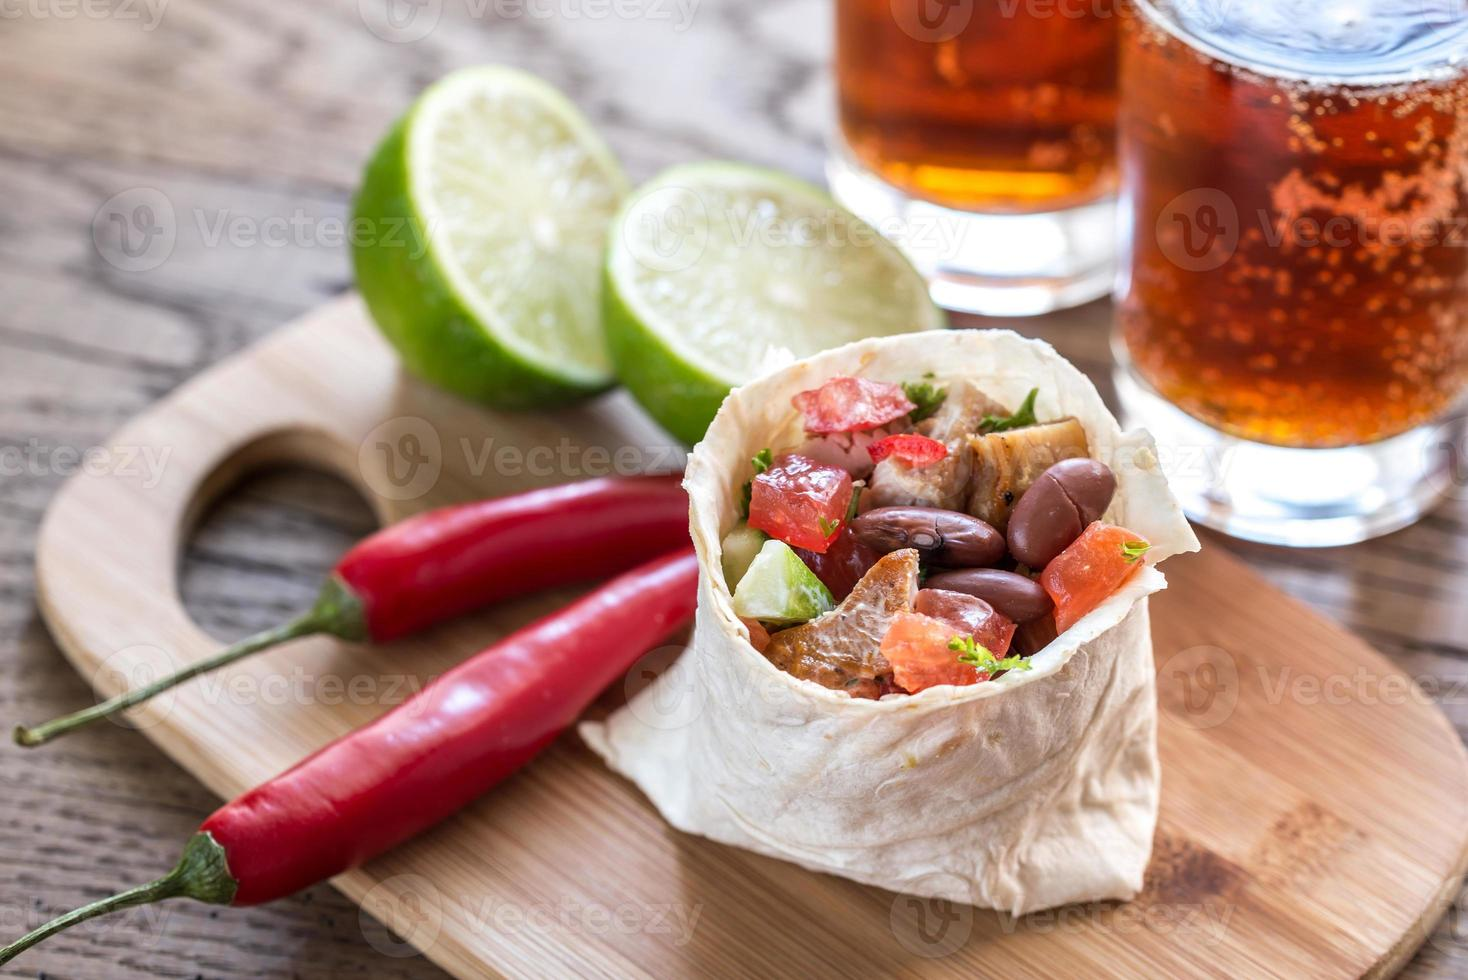 kip burrito met glazen bier foto